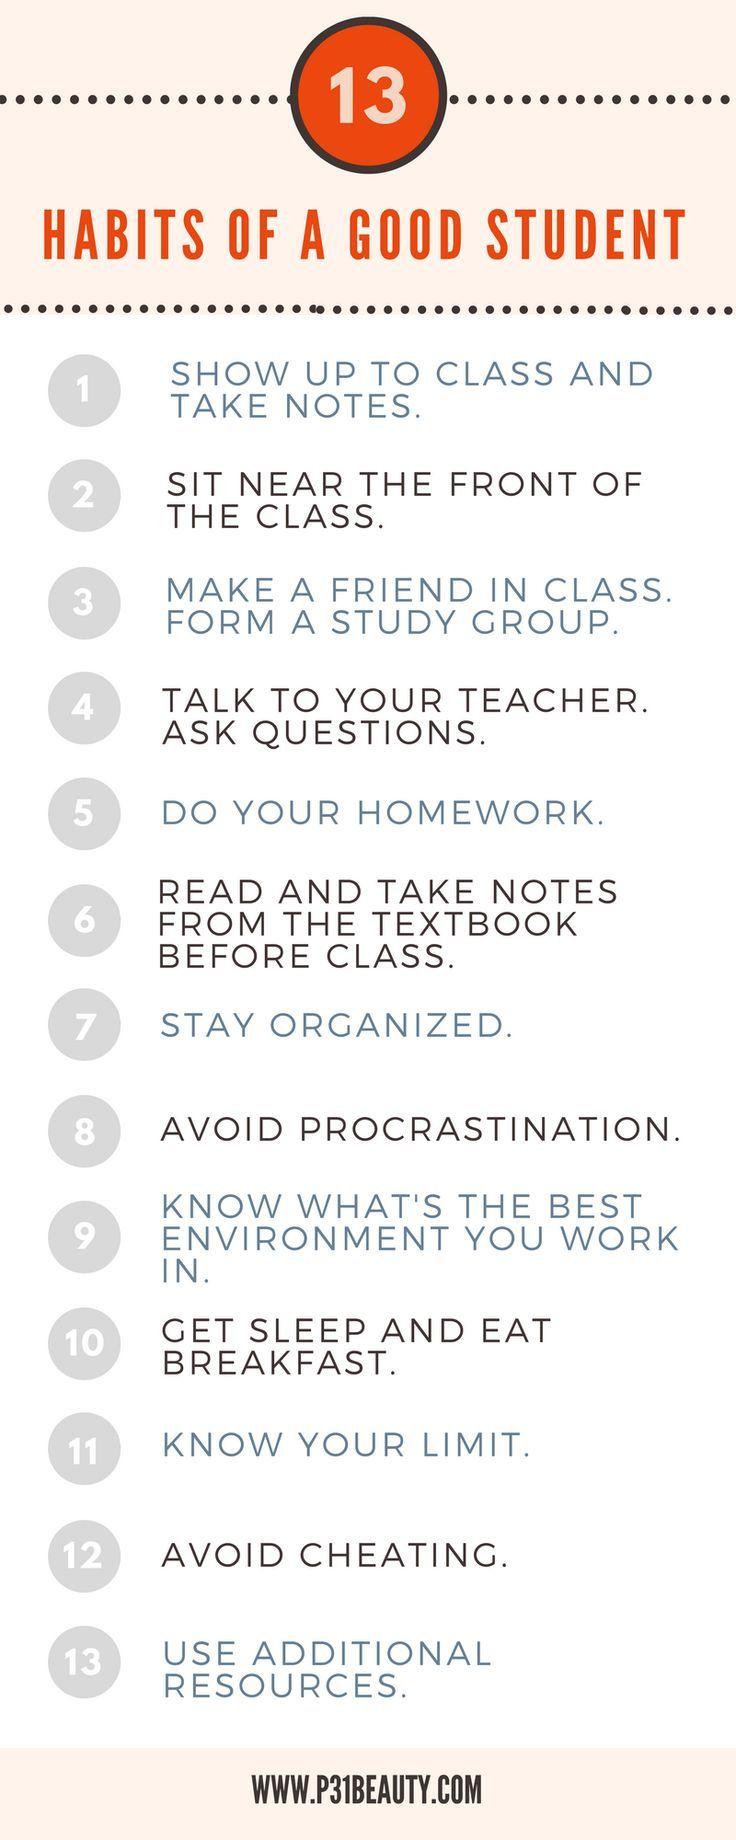 Good homework habits high school marx alienated labor essay